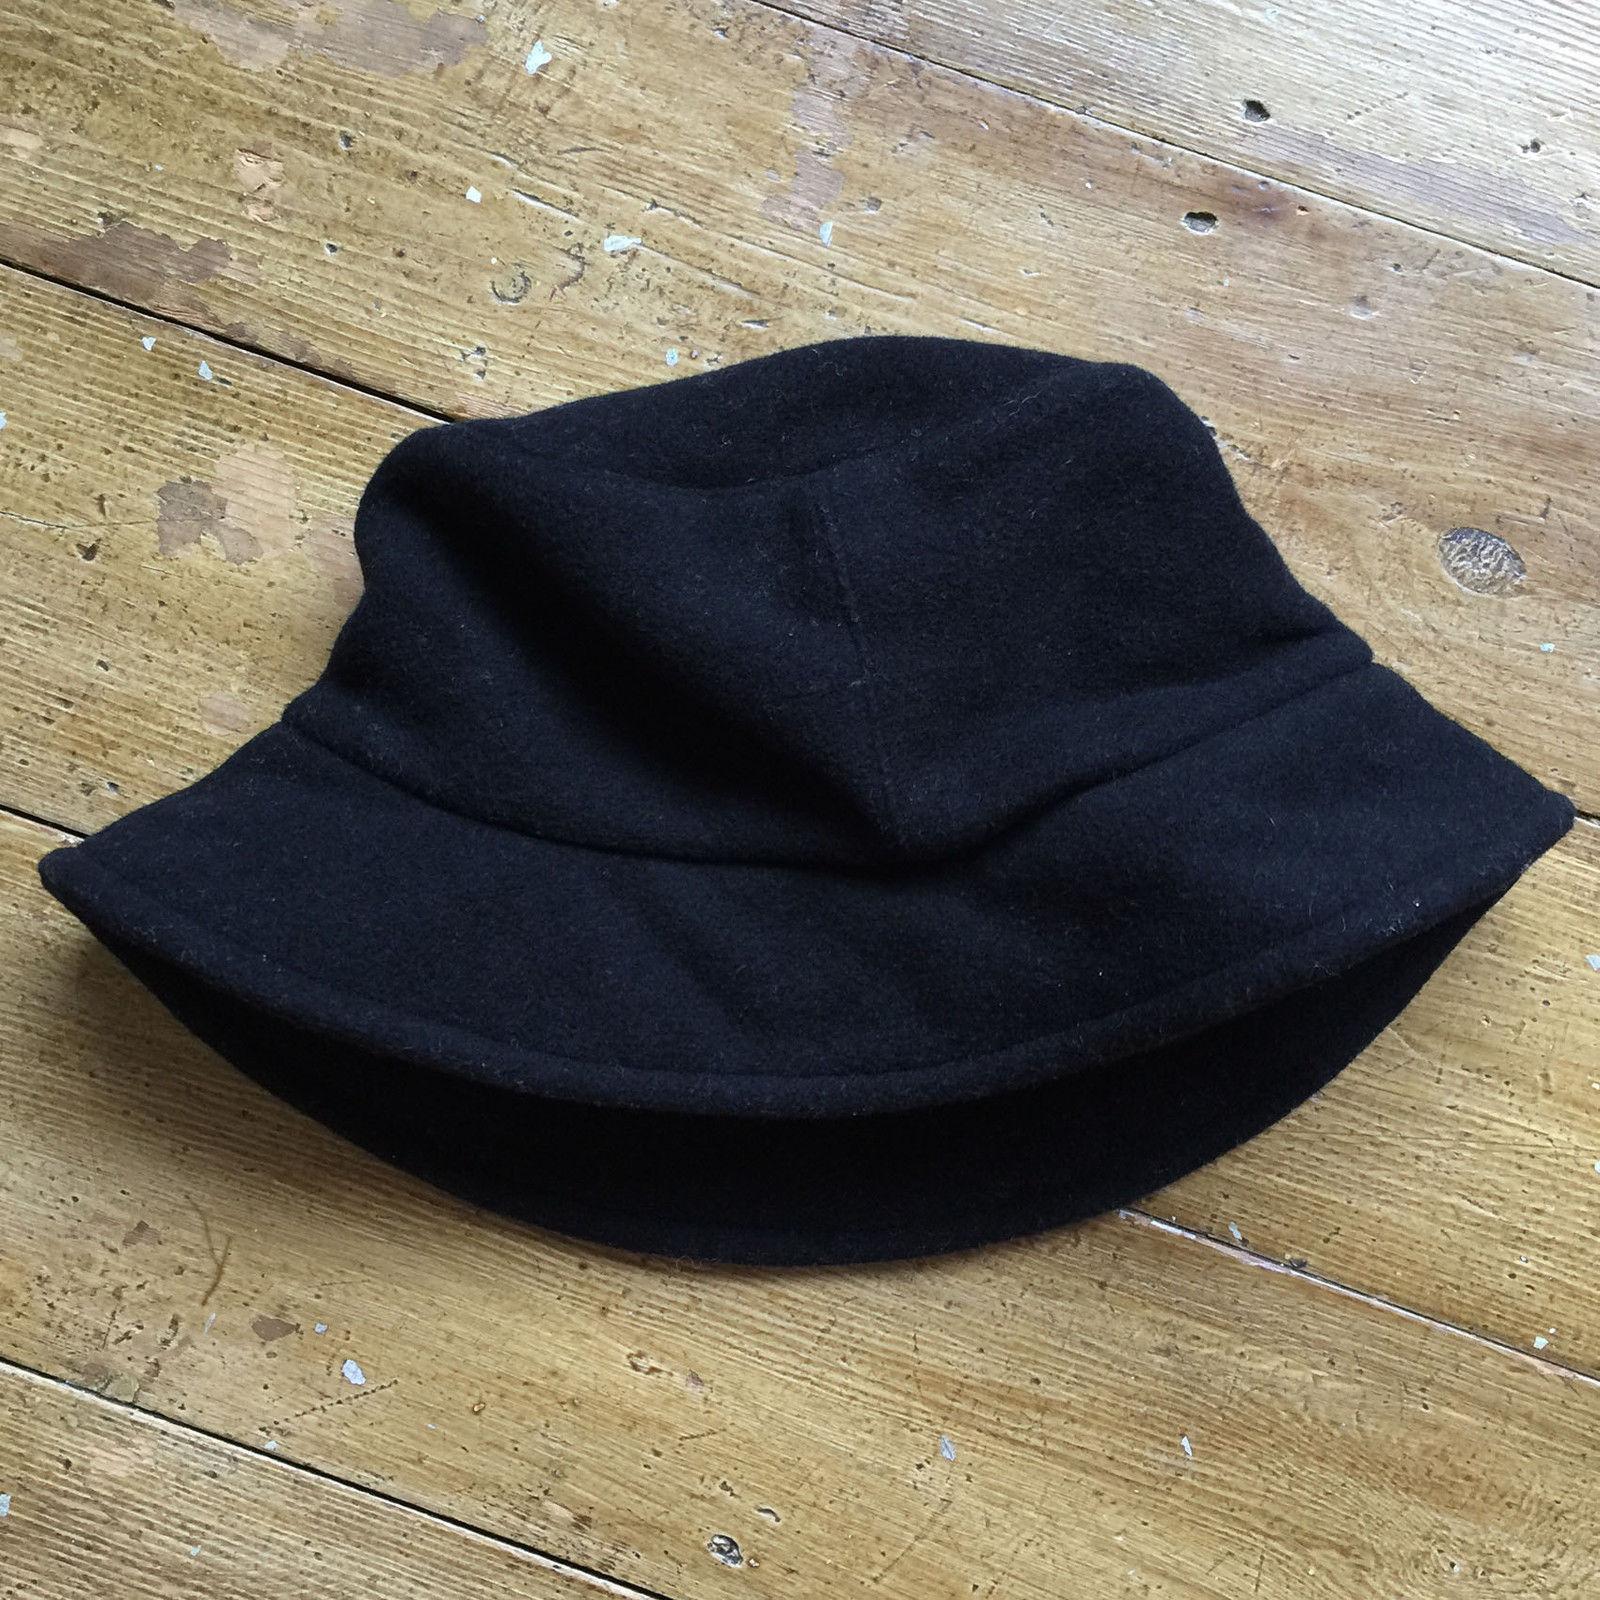 A.P.C. APC Bucket Hat Wool Black Medium Size one size - Hats for ... 98b71b46738